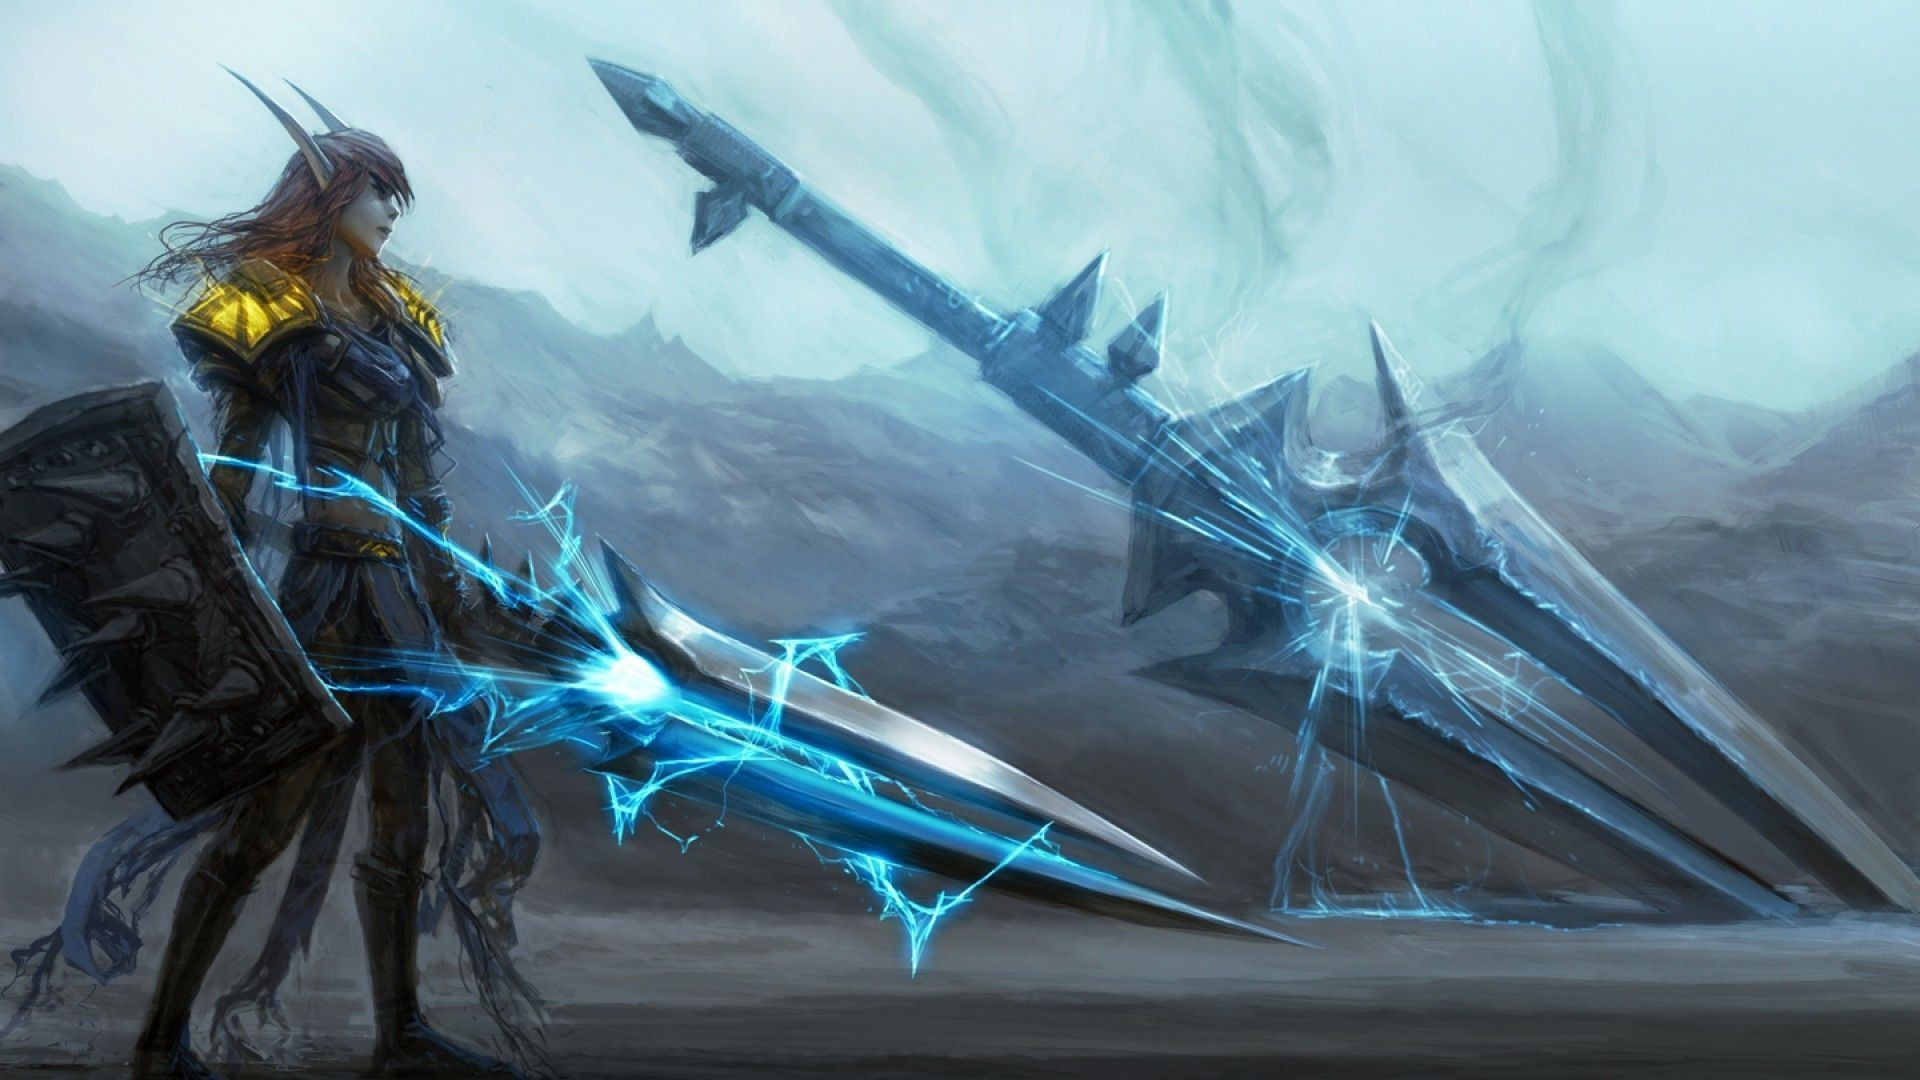 World of Warcraft The Burning Crusade HD desktop wallpaper | HD Wallpapers  | Pinterest | Hd desktop and Wallpaper